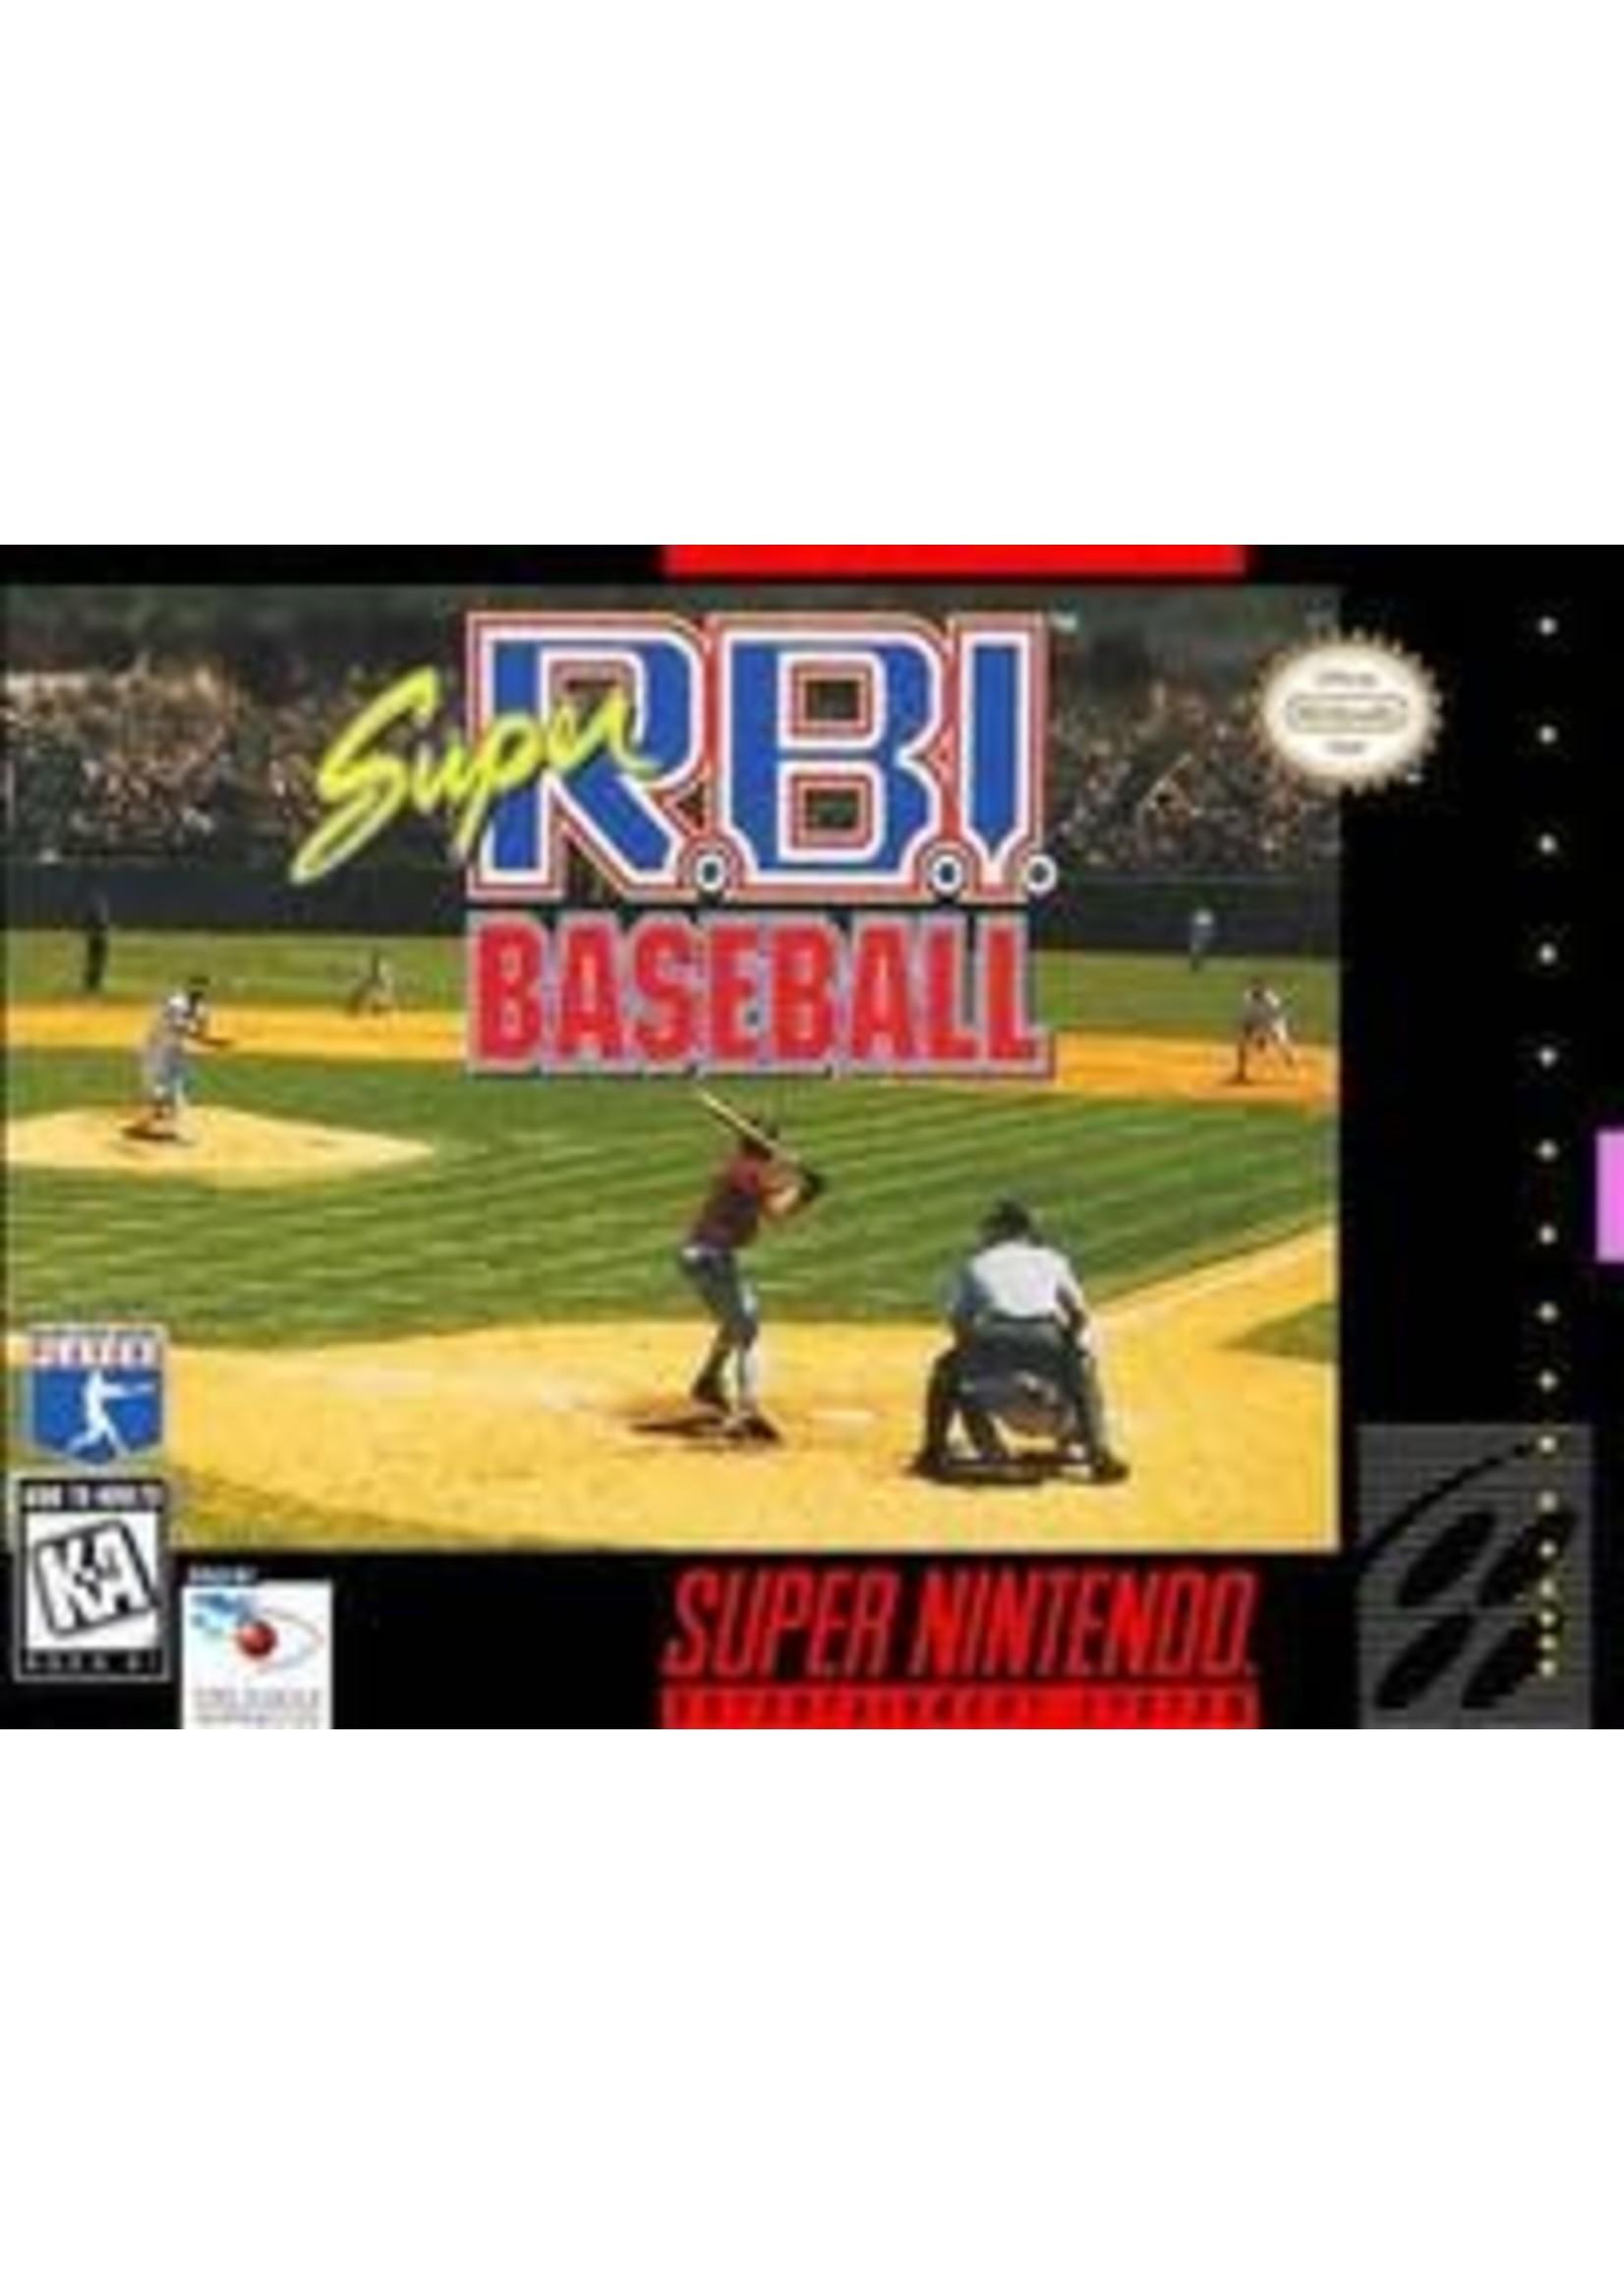 Super RBI Baseball (Super Nintendo)